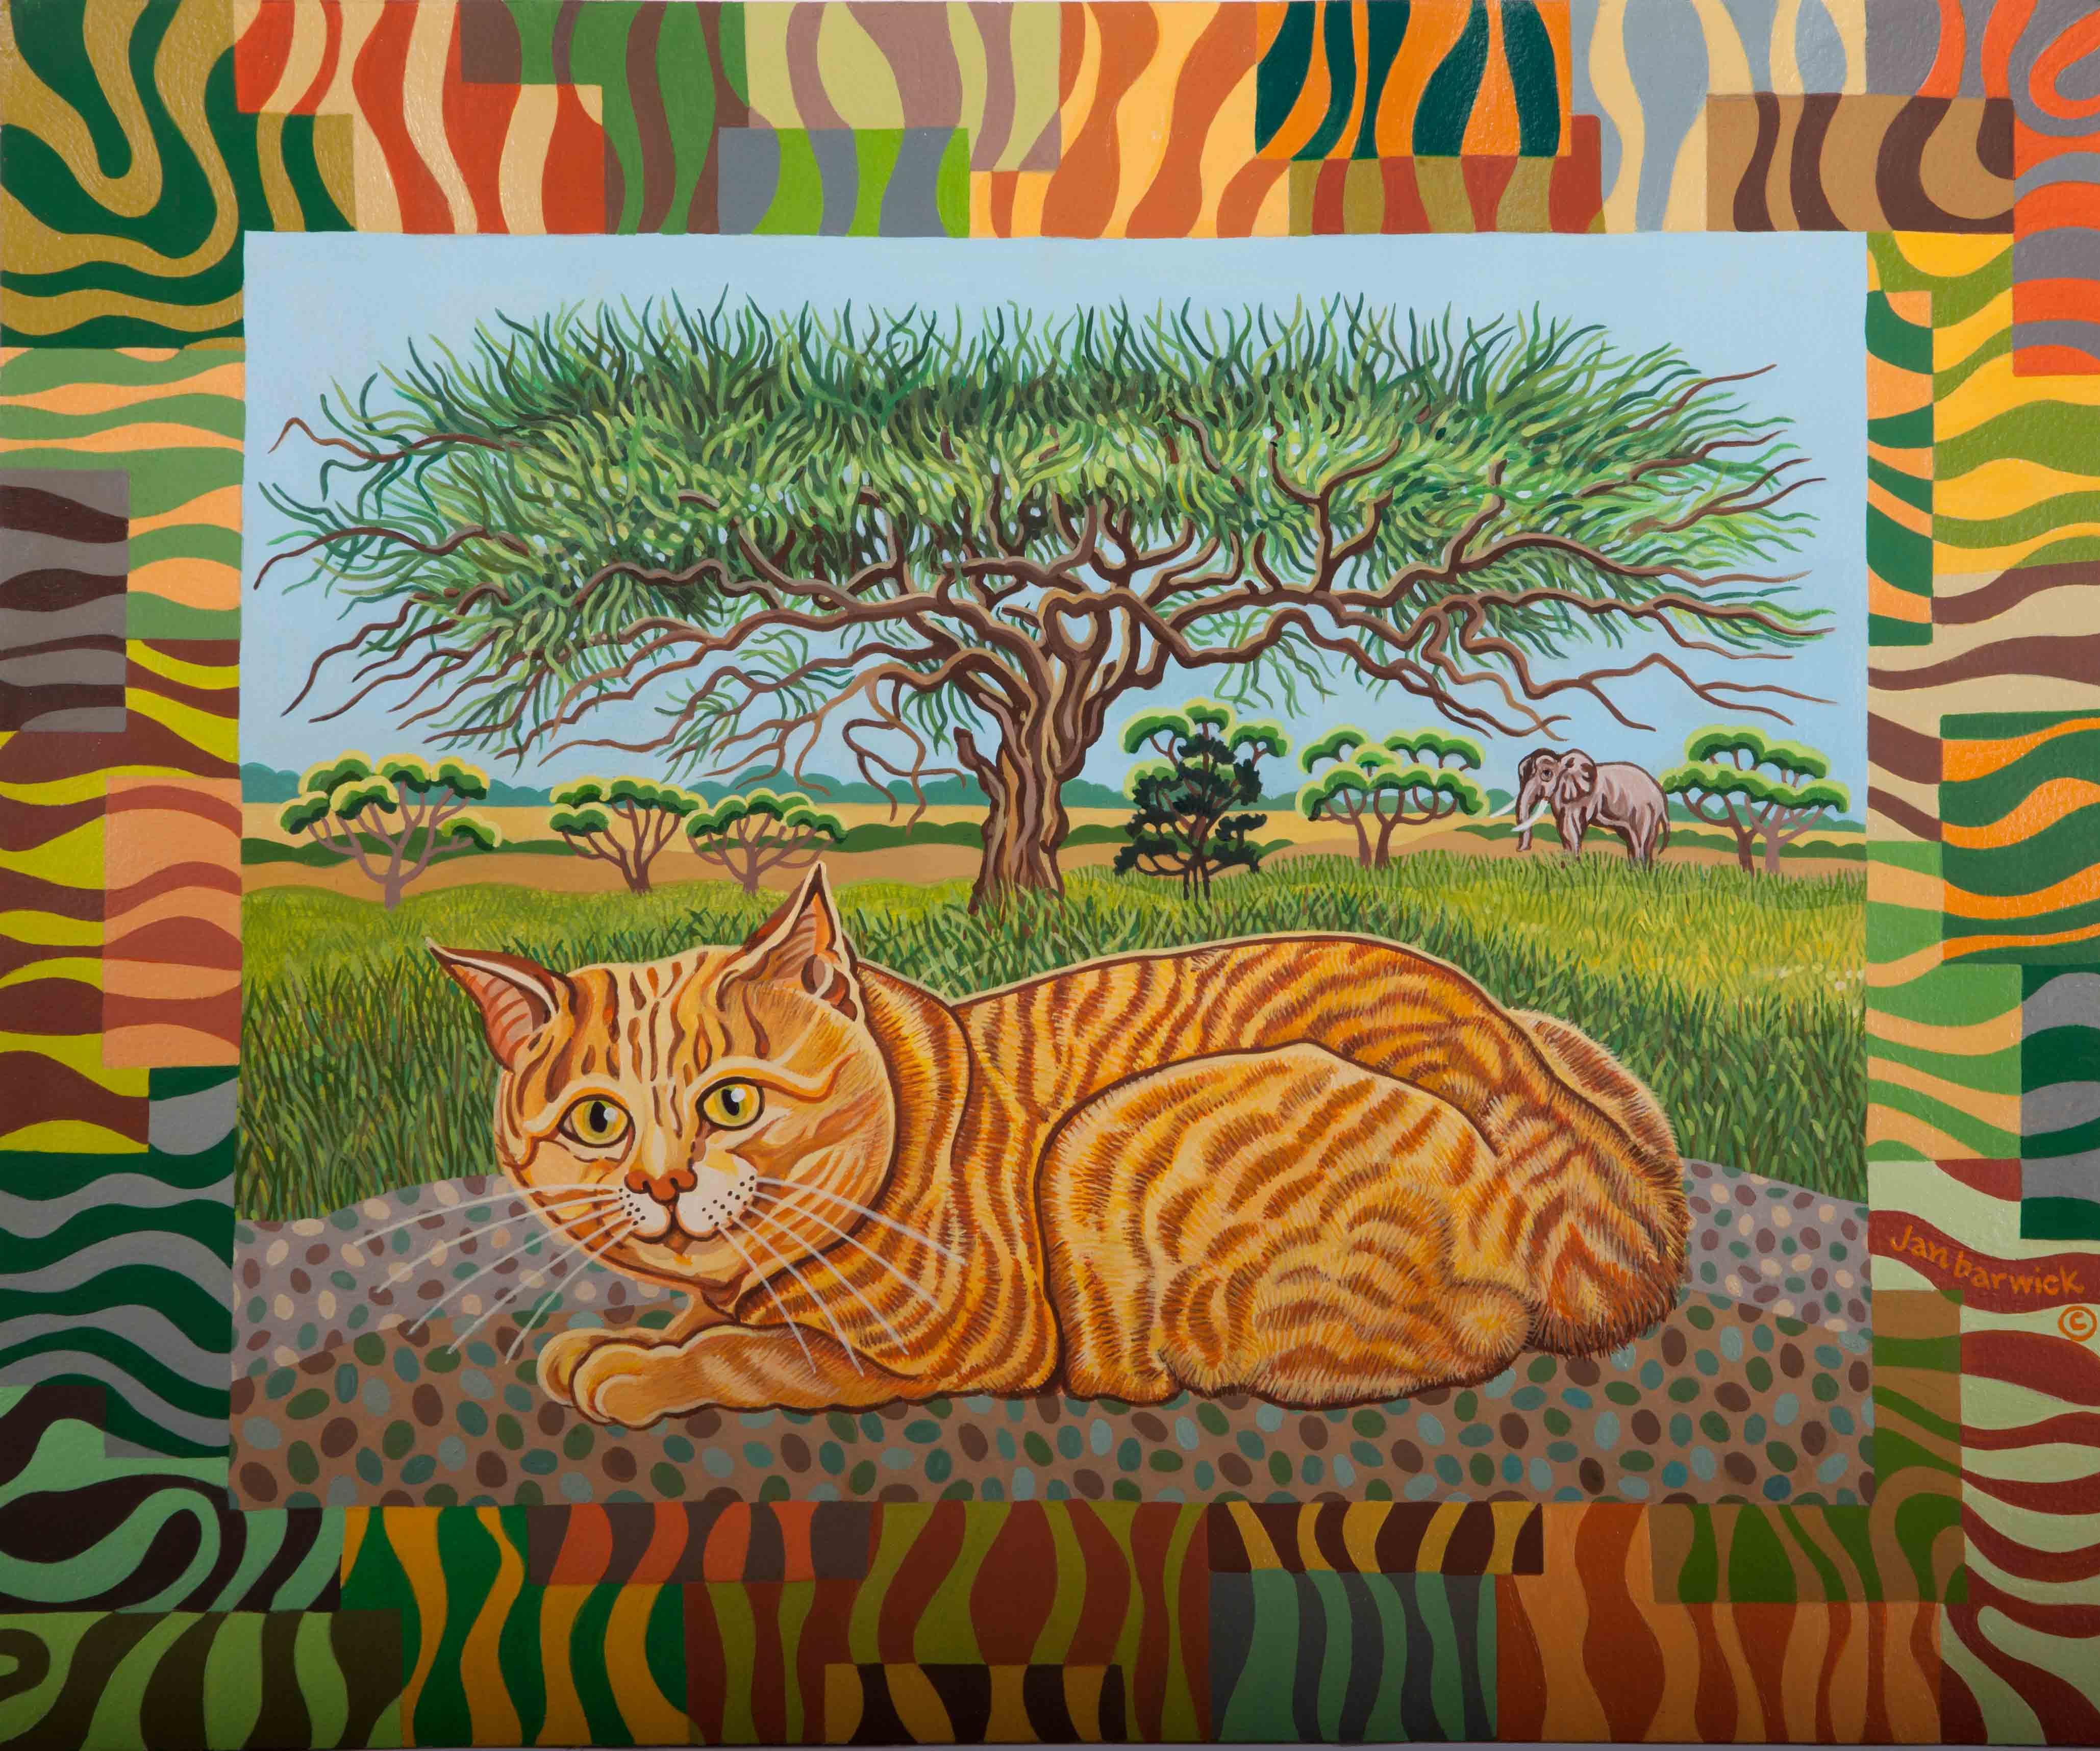 Adventures of an African Cat 1